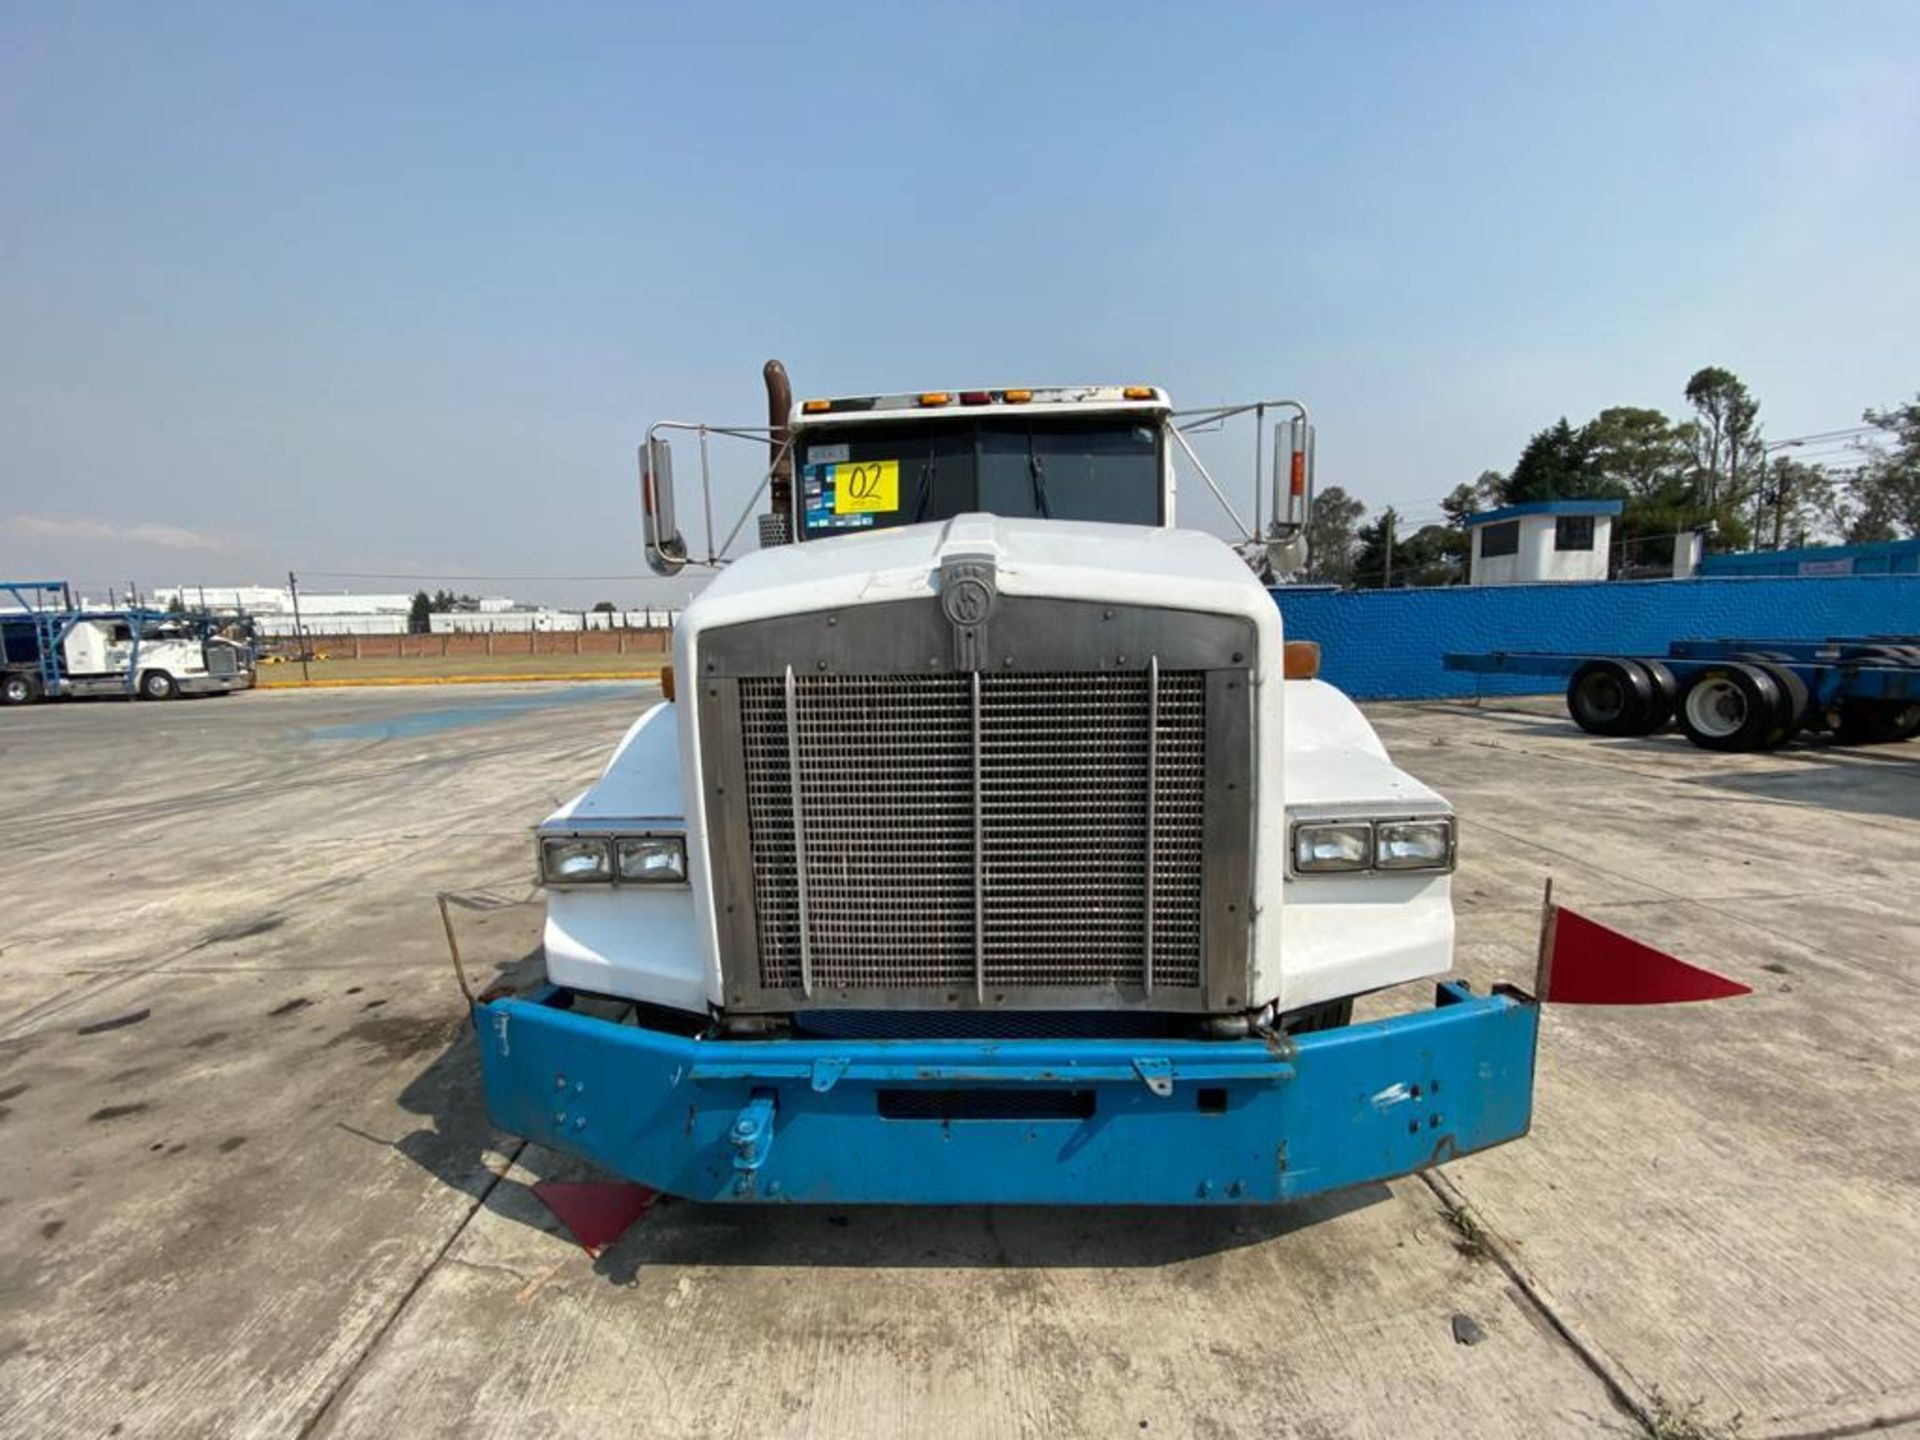 1999 Kenworth Sleeper truck tractor, standard transmission of 18 speeds - Image 6 of 75